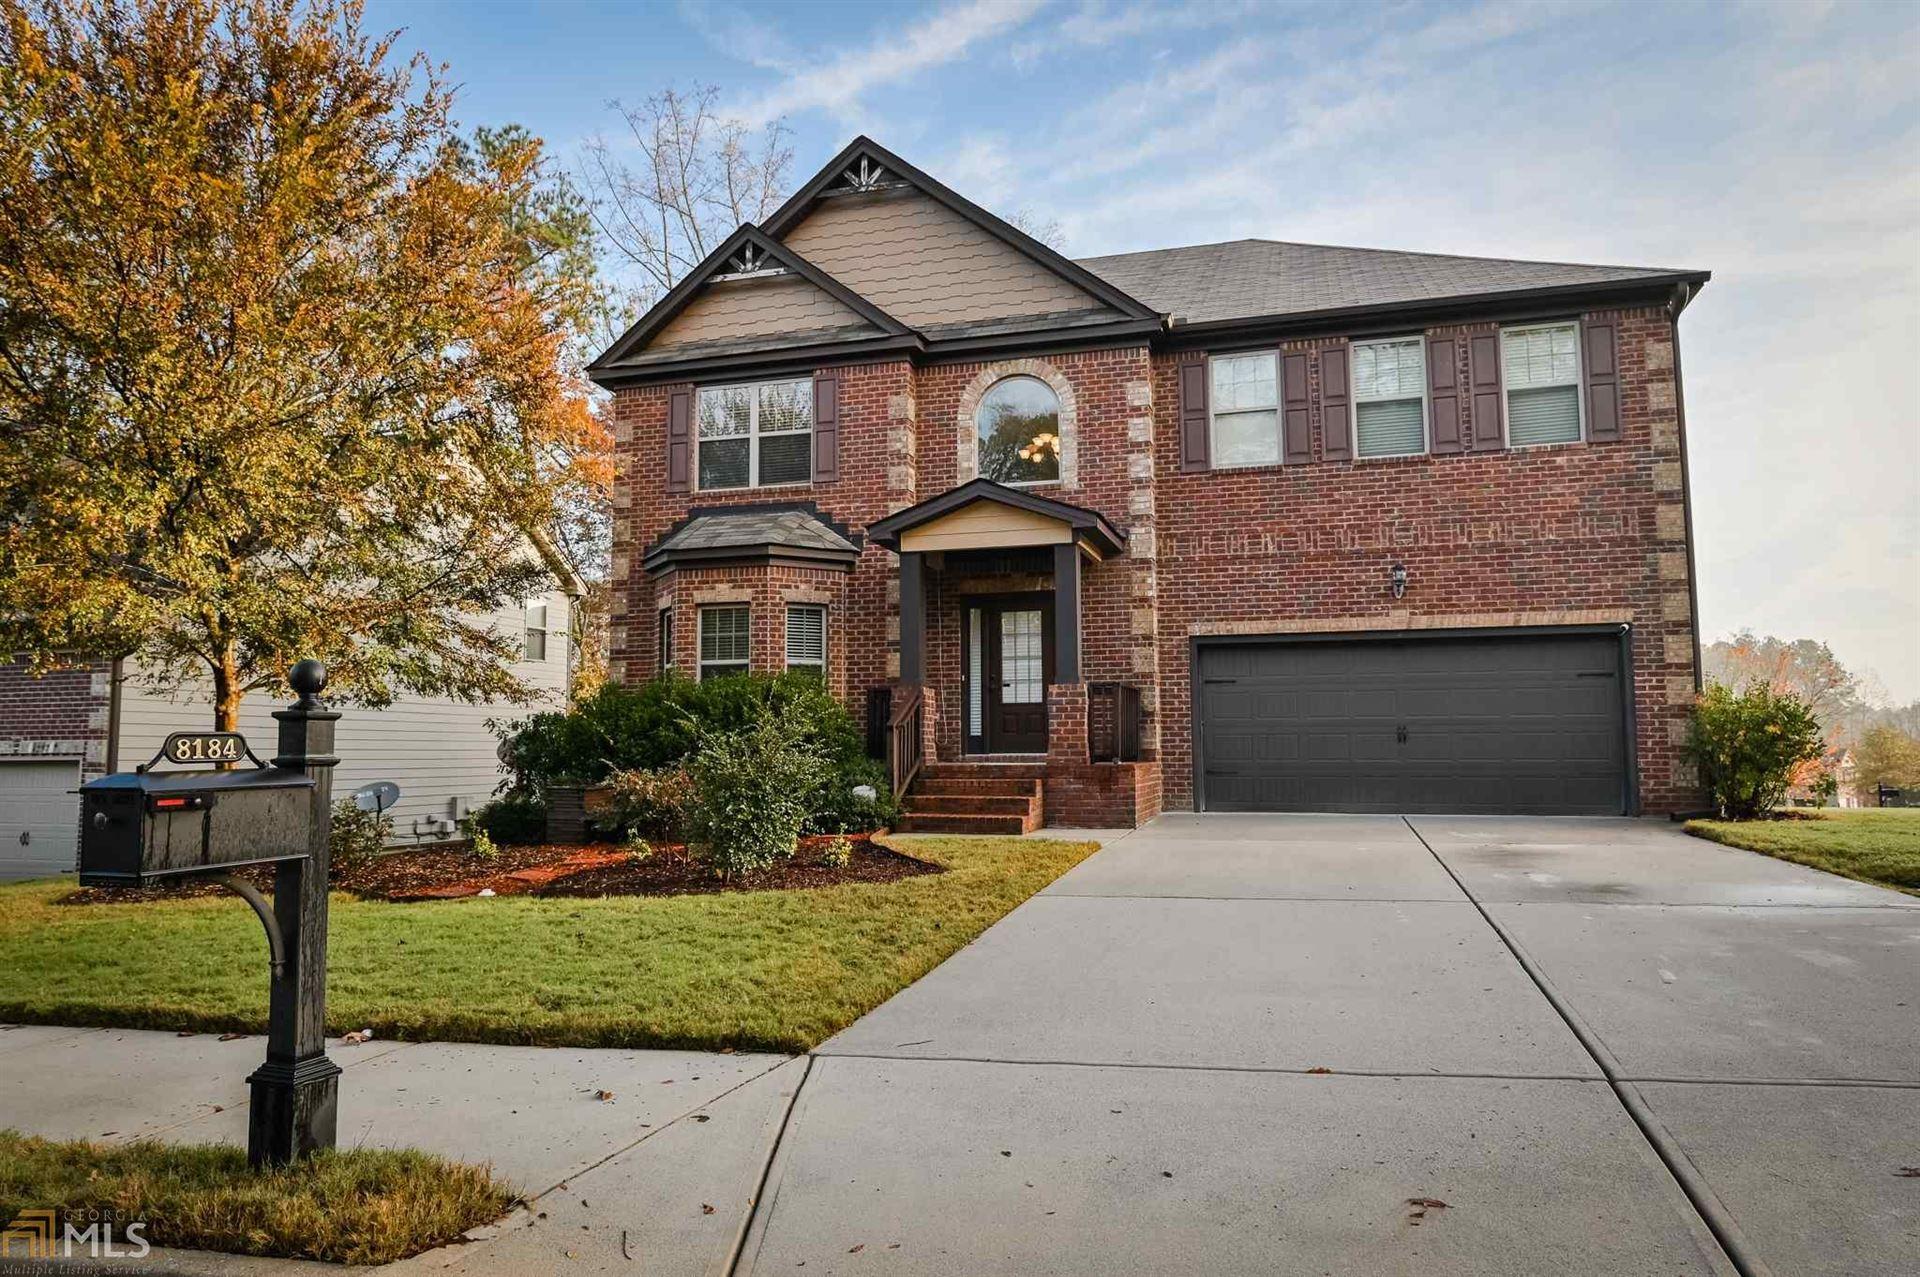 8184 Plantation Trce, Covington, GA 30014 - MLS#: 8894736